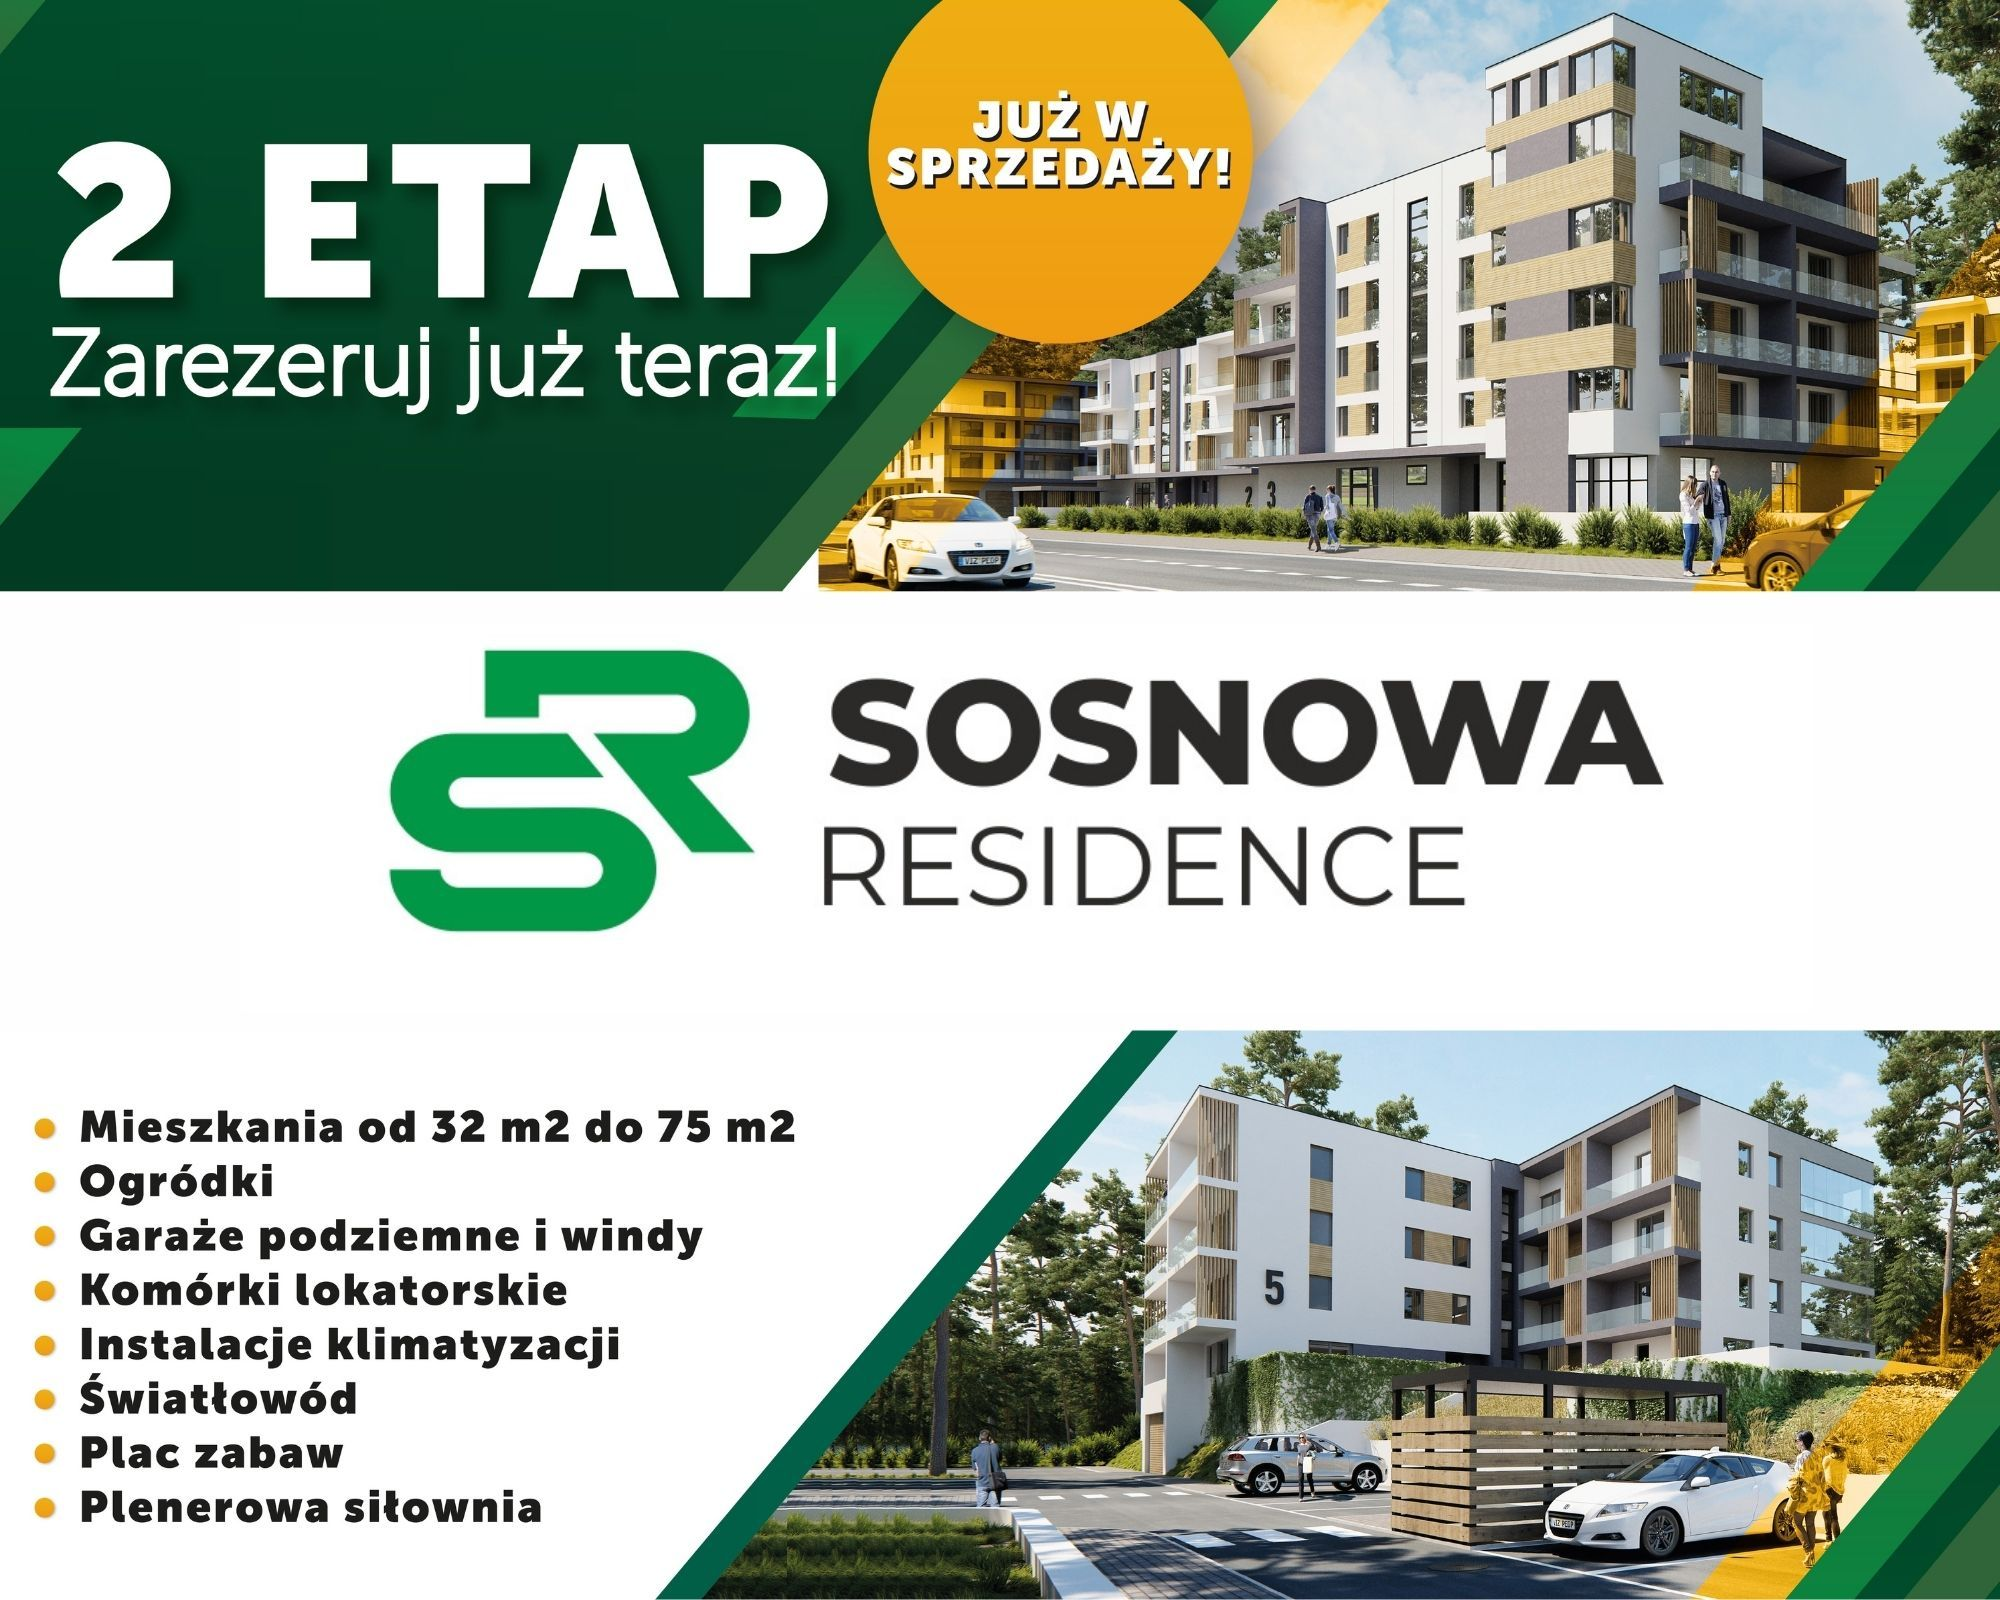 sosnowa residence drugi etap